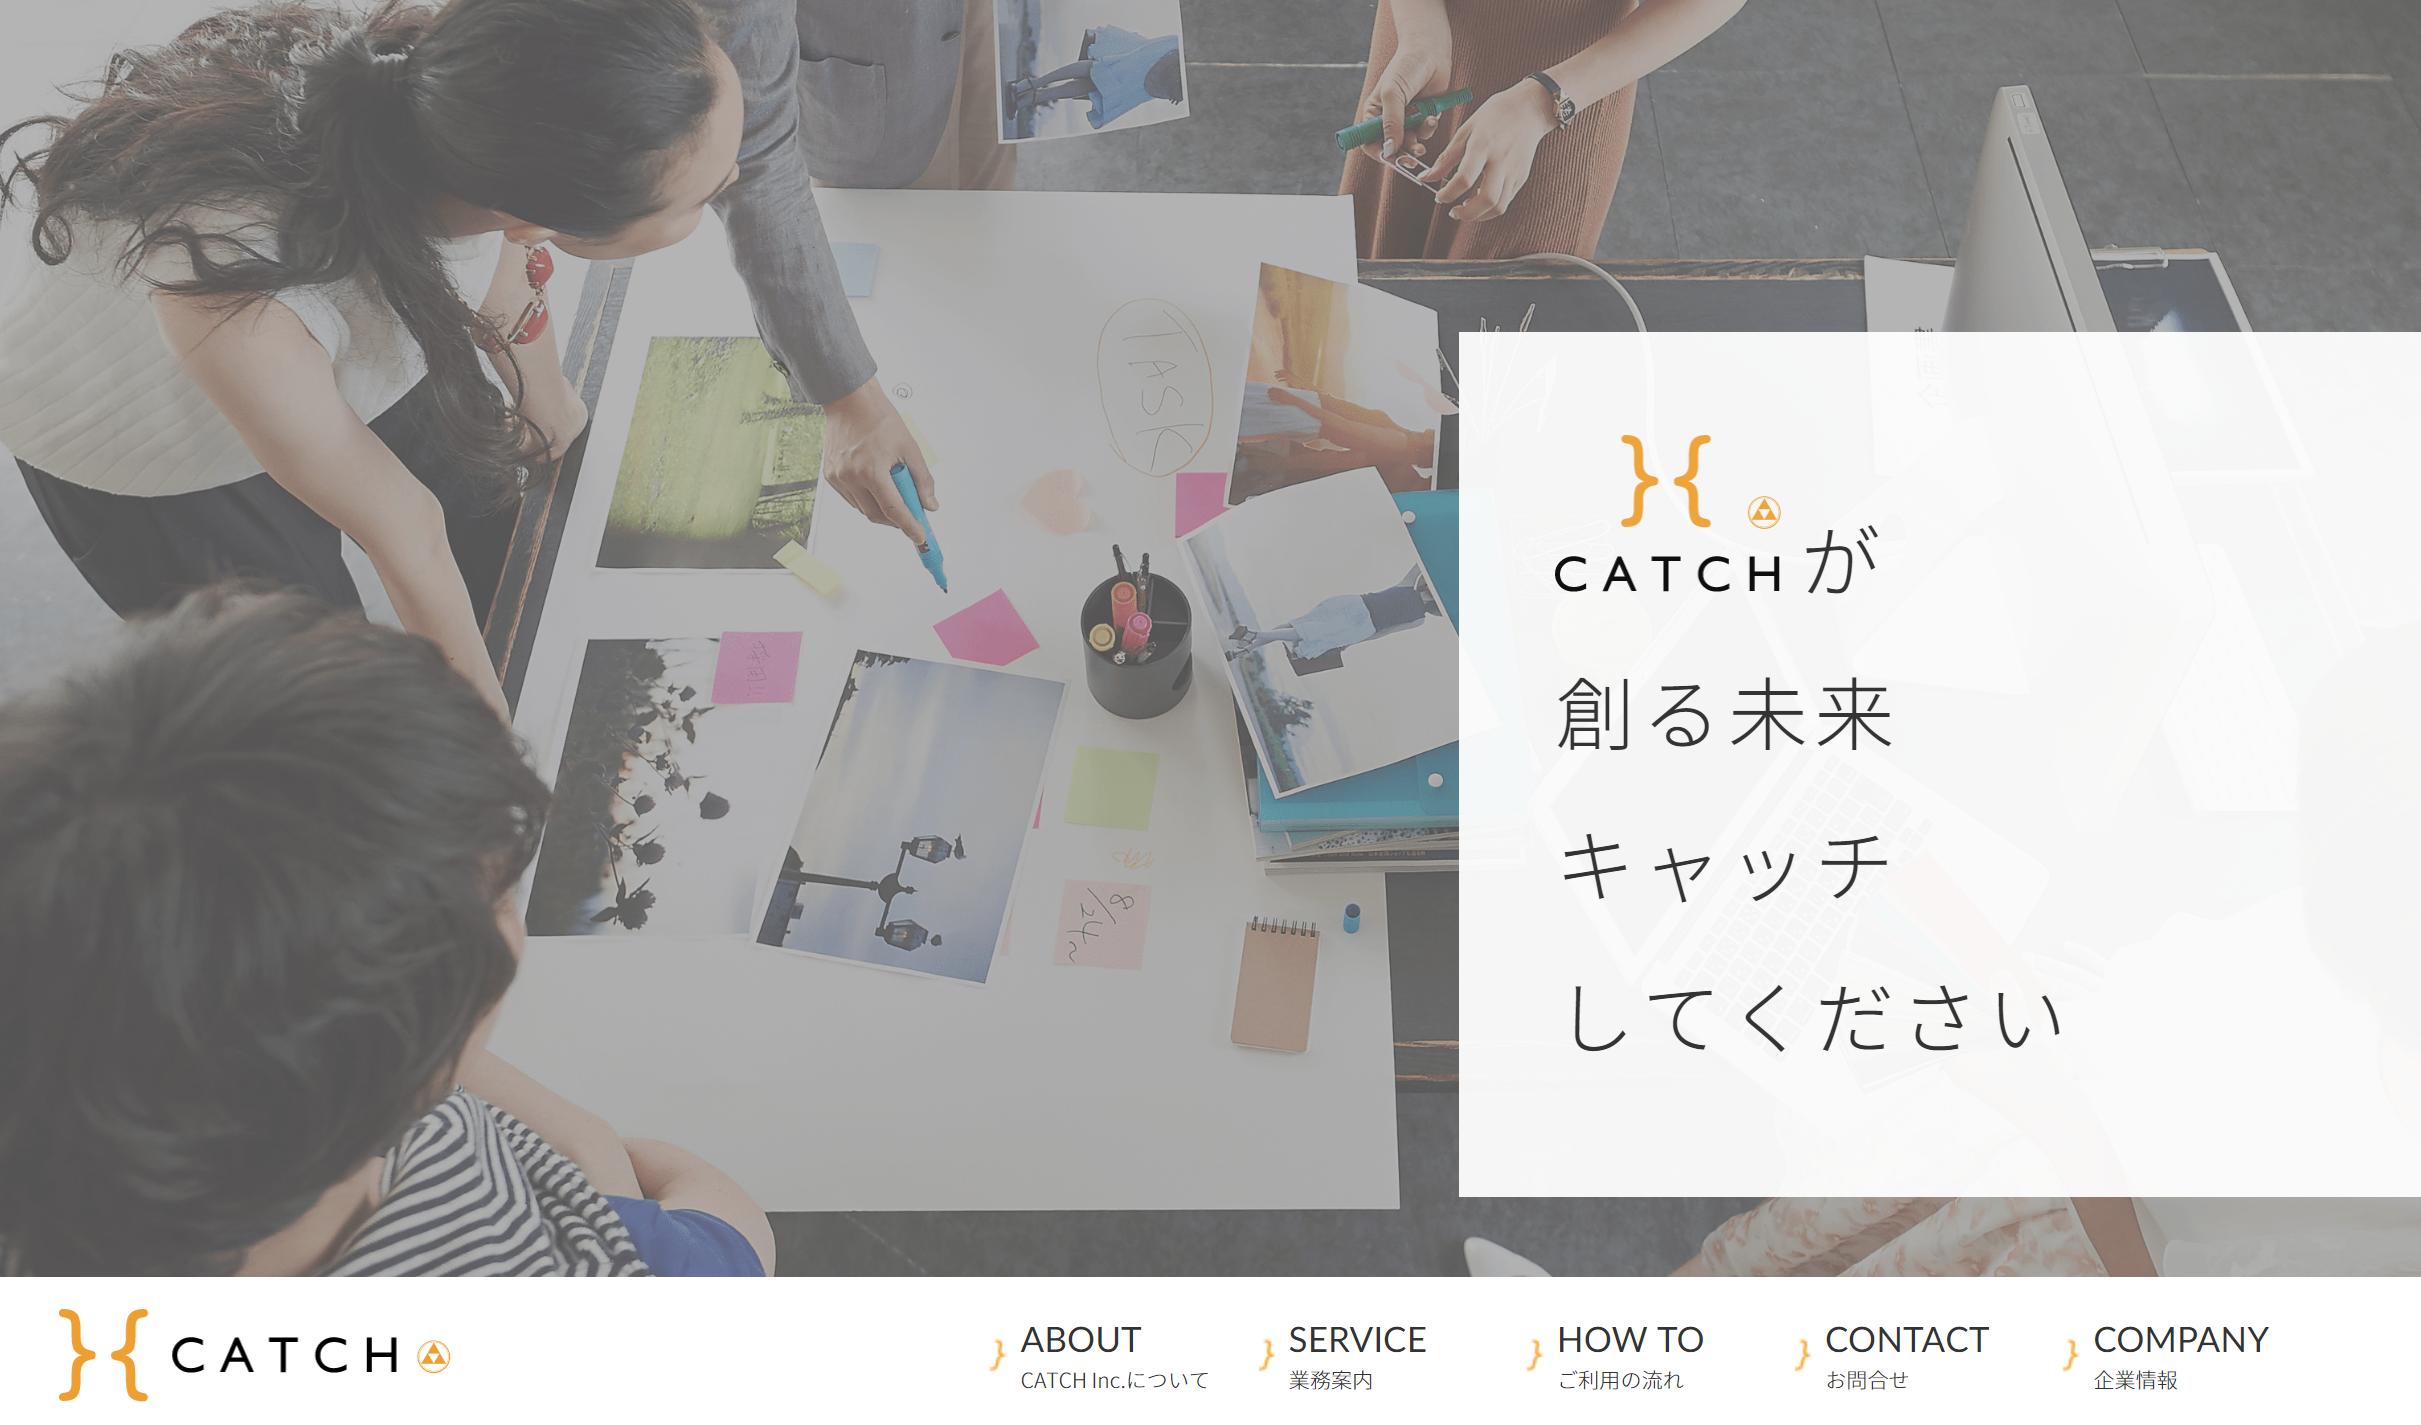 【WEB制作事例】障がい者就労支援 株式会社キャッチ